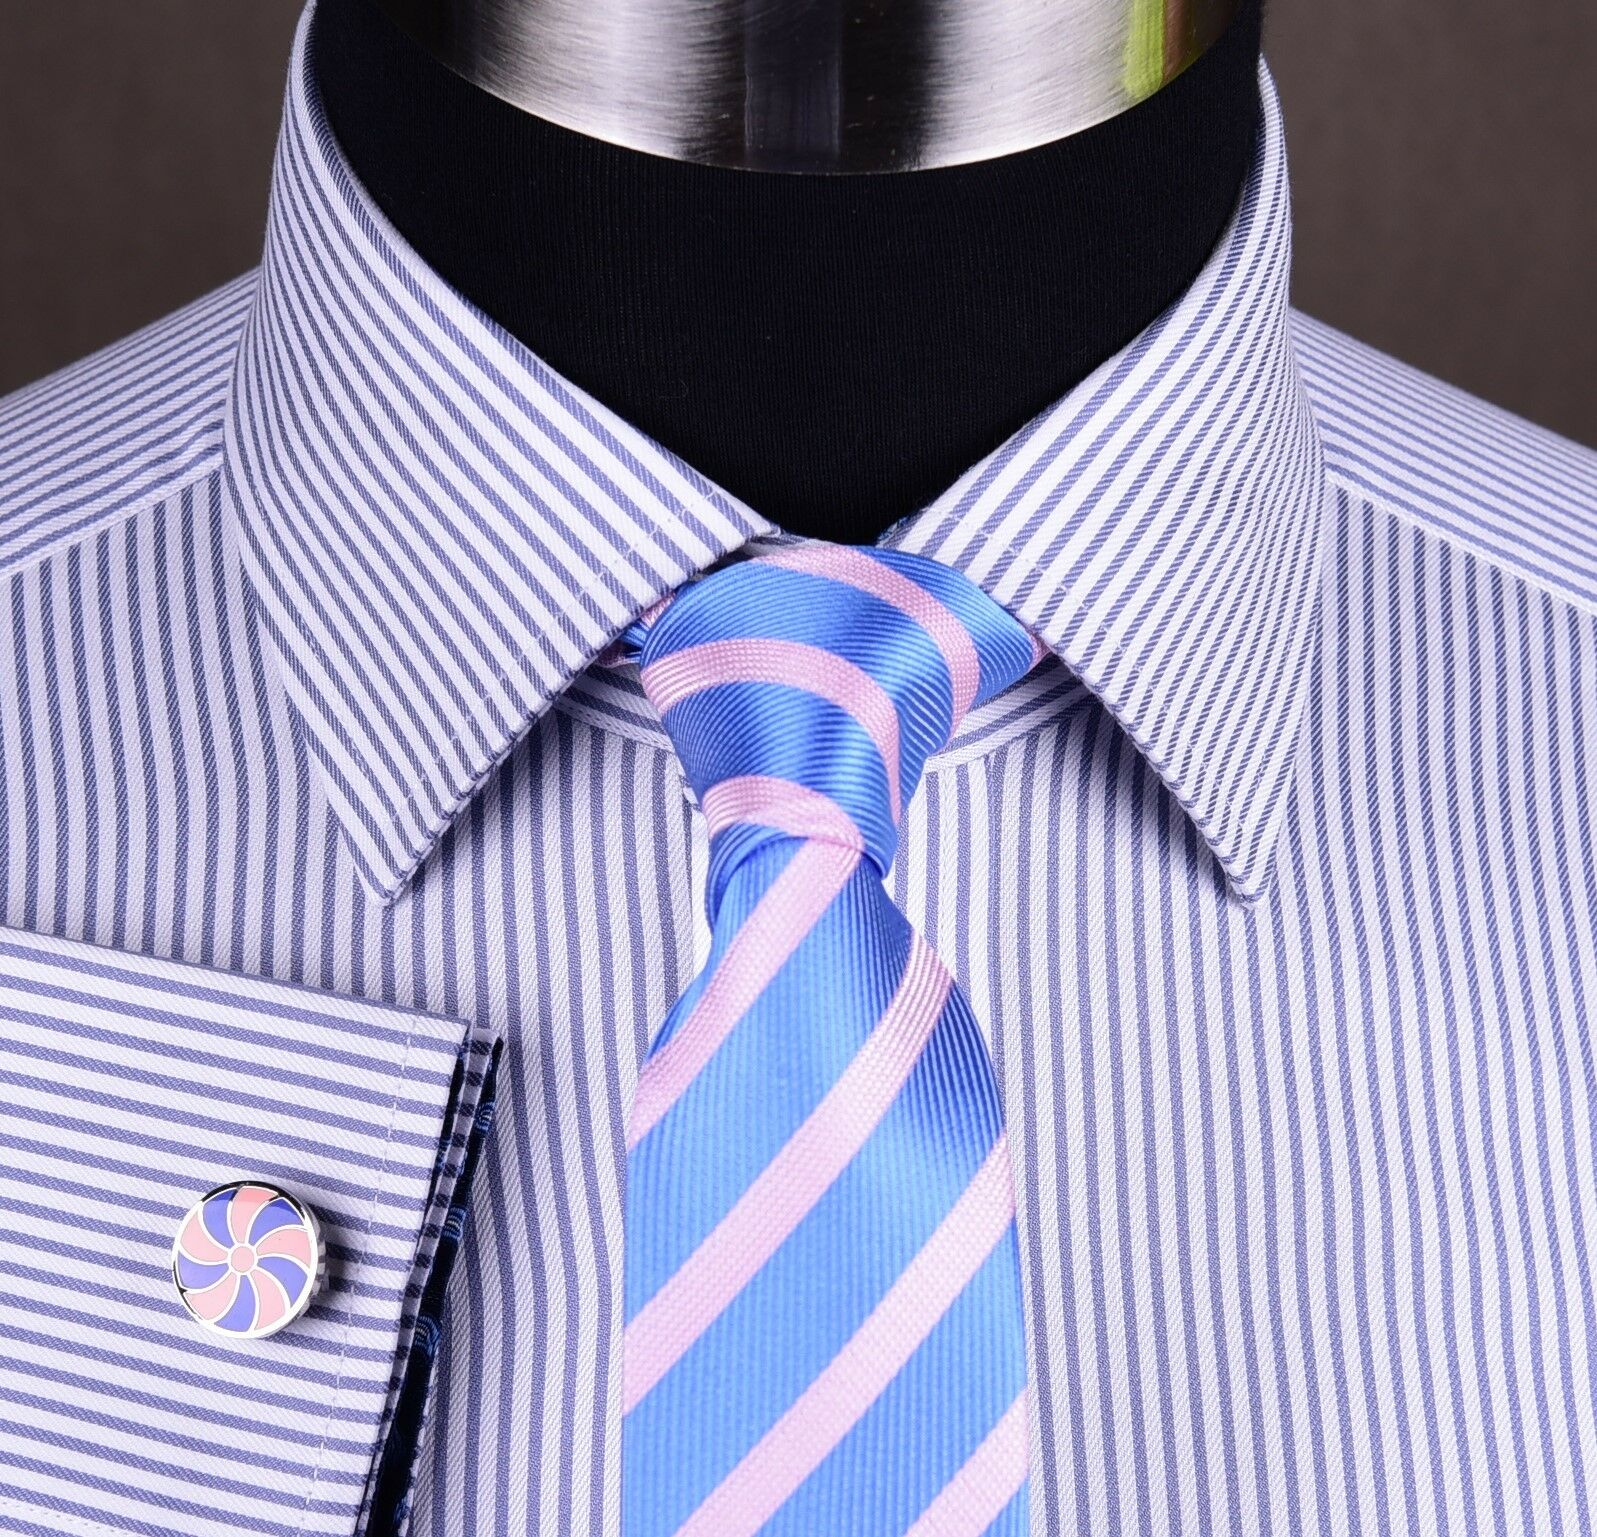 lila Stripe Twill Formal Geschäft Dress Shirt Luxury Designer Fashion Boss Top